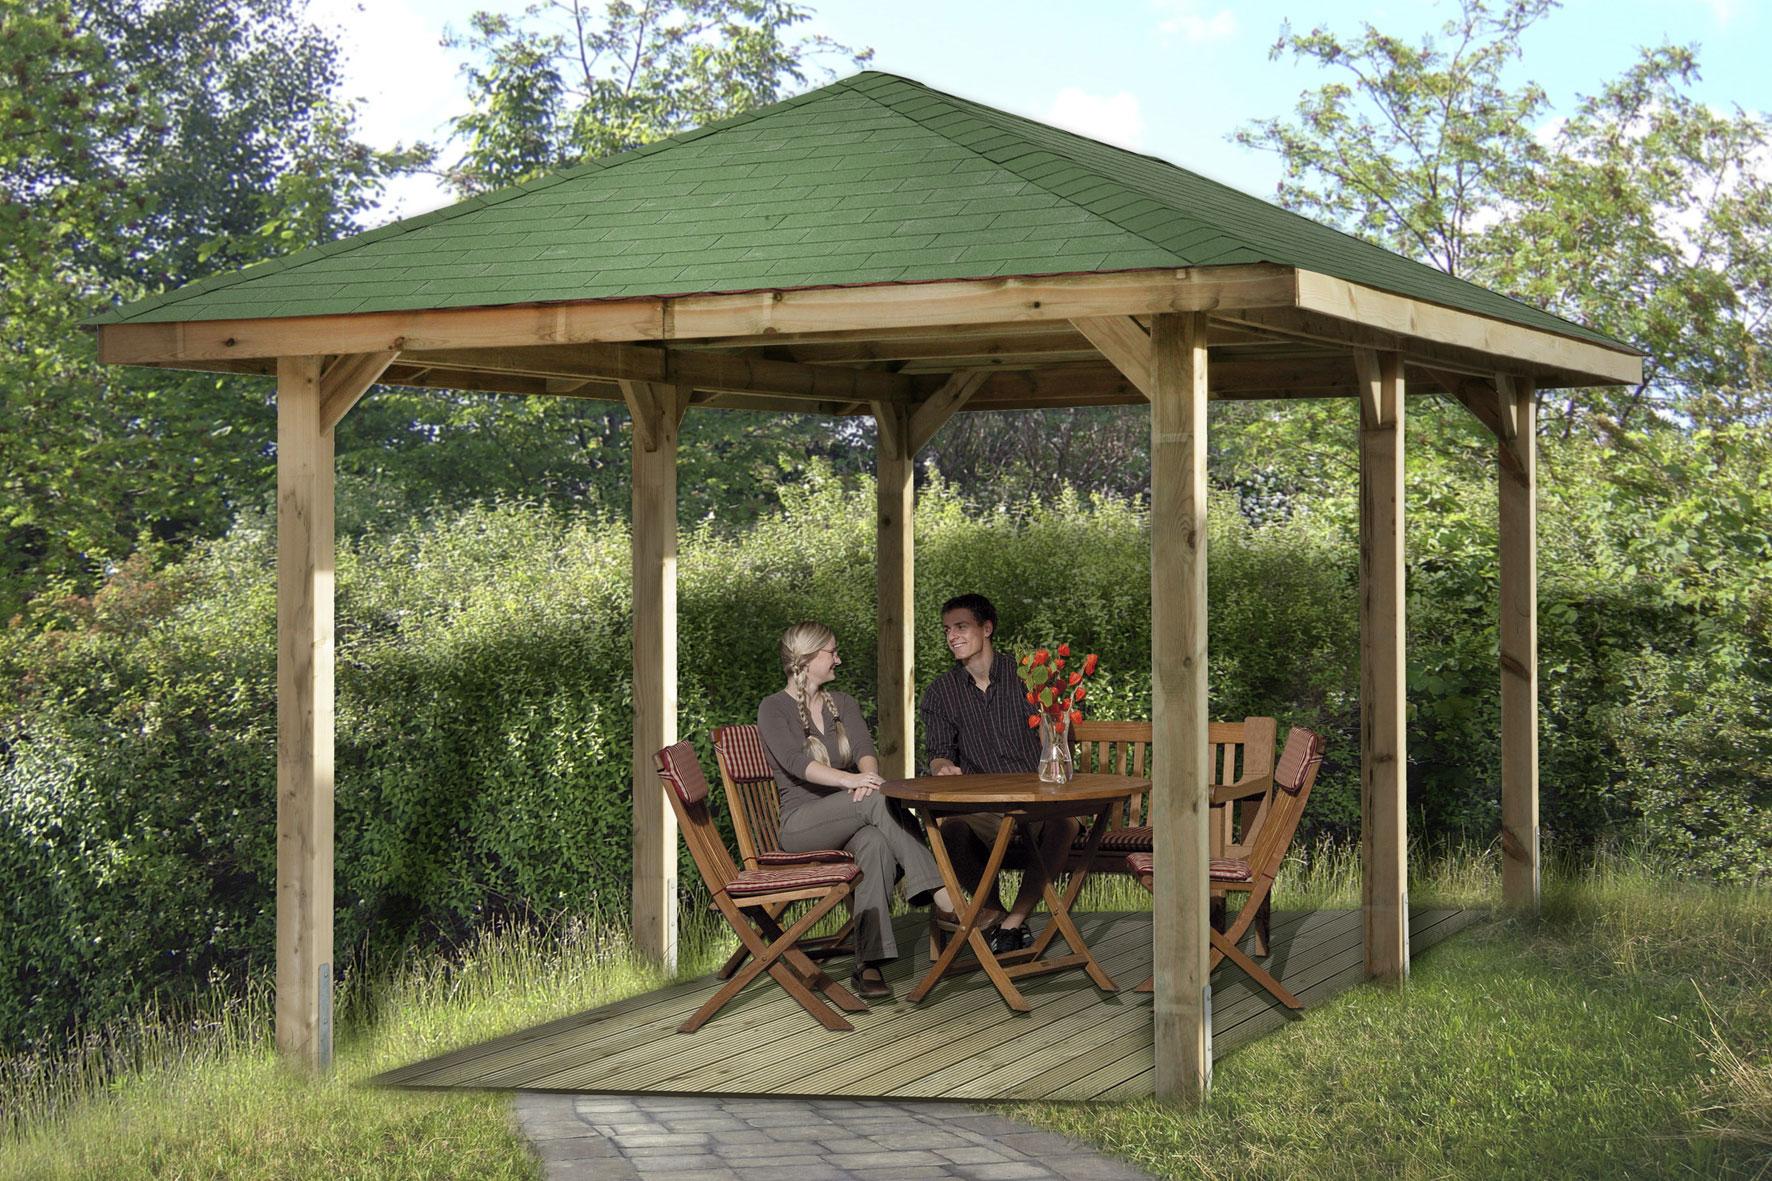 weka pavillon carport gartenoase 651d gr 1 kdi 584x333cm bei. Black Bedroom Furniture Sets. Home Design Ideas